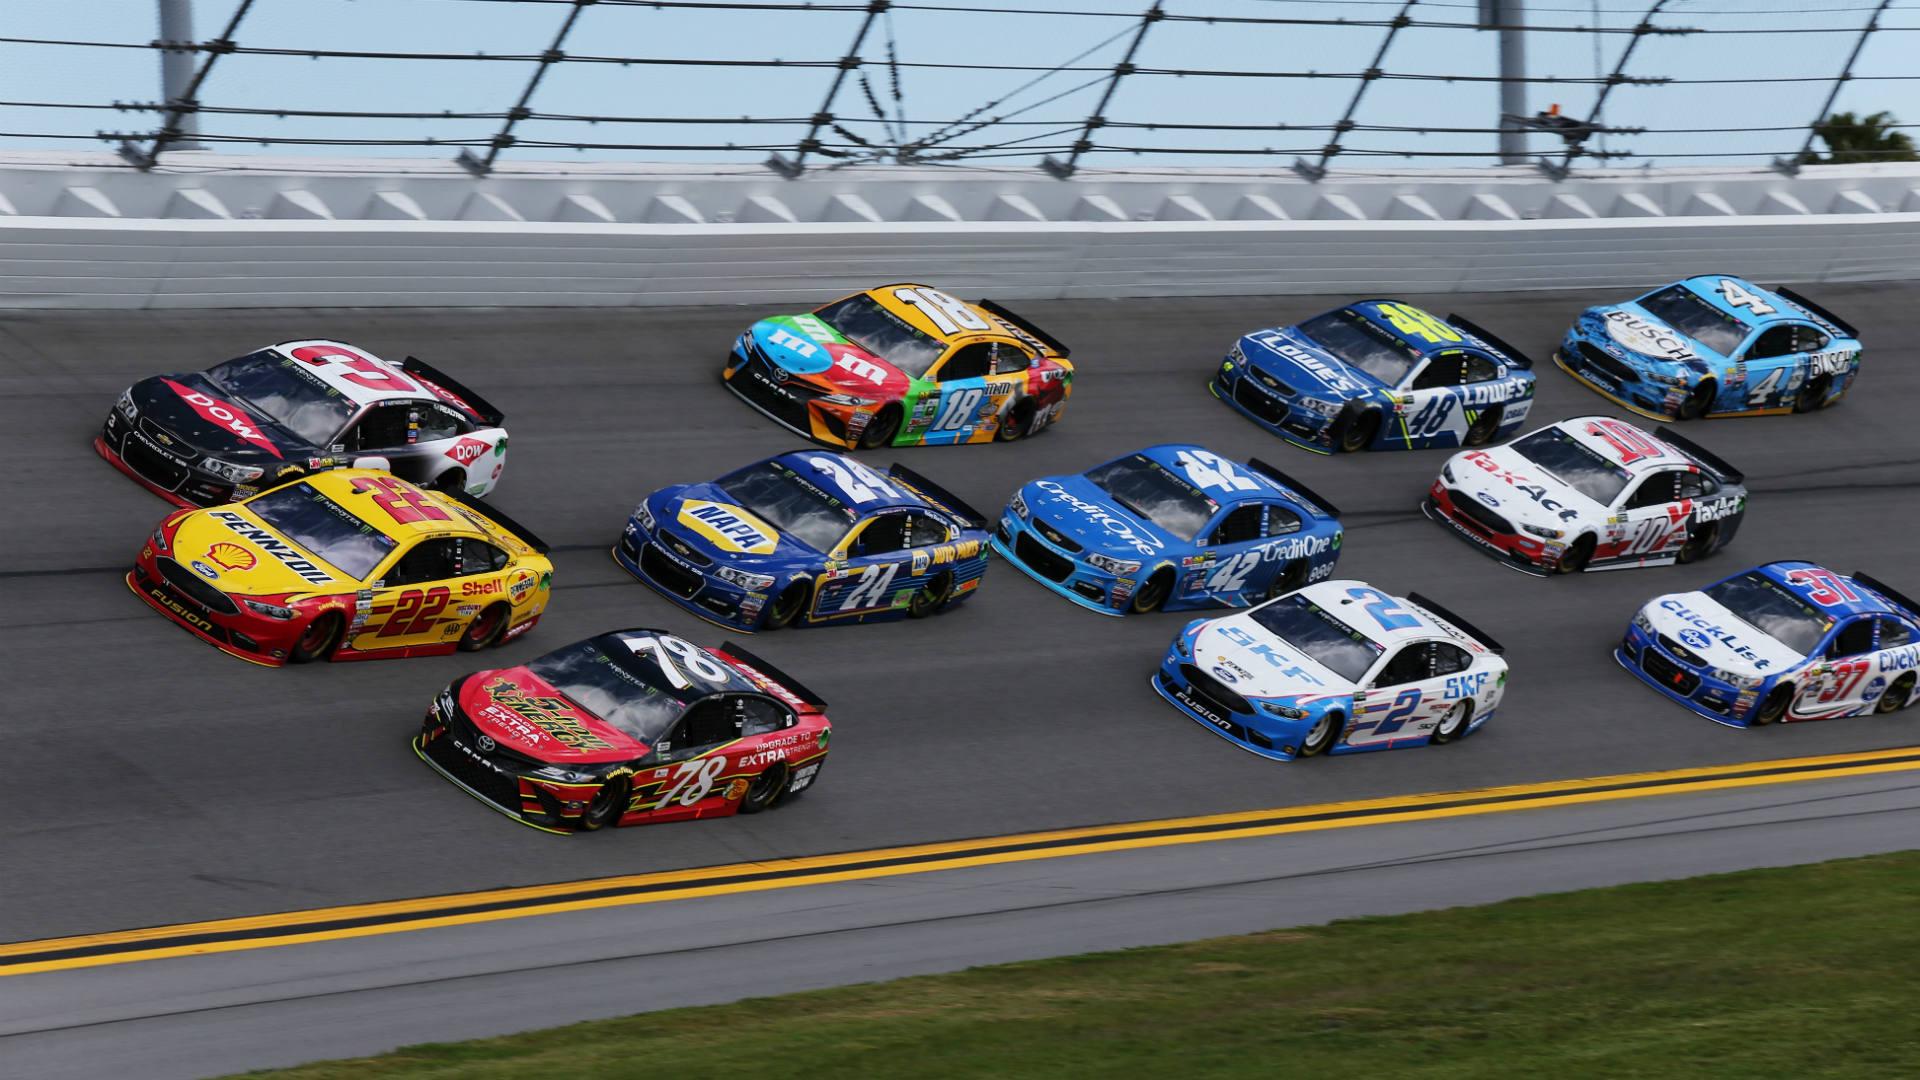 Clash at Daytona 2018: Brad Keselowski's win and updates ...